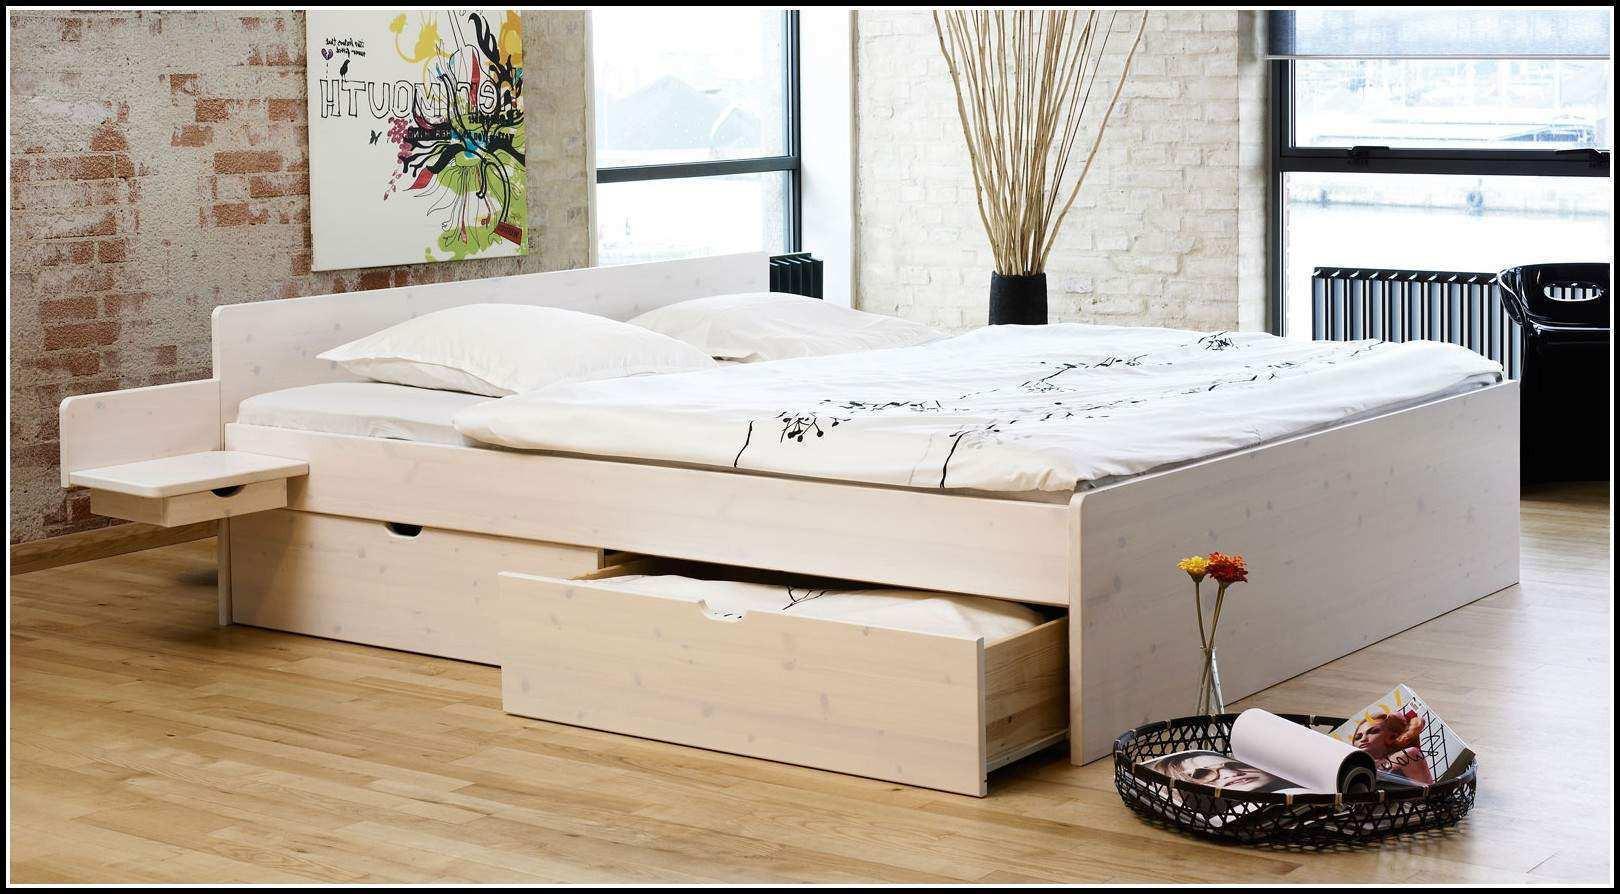 Full Size of Rattanbett Ikea Massivholzbett Watersoftnerguide M2 Fhrung Beste Mbelideen Küche Kaufen Betten 160x200 Bei Kosten Sofa Mit Schlaffunktion Modulküche Wohnzimmer Rattanbett Ikea